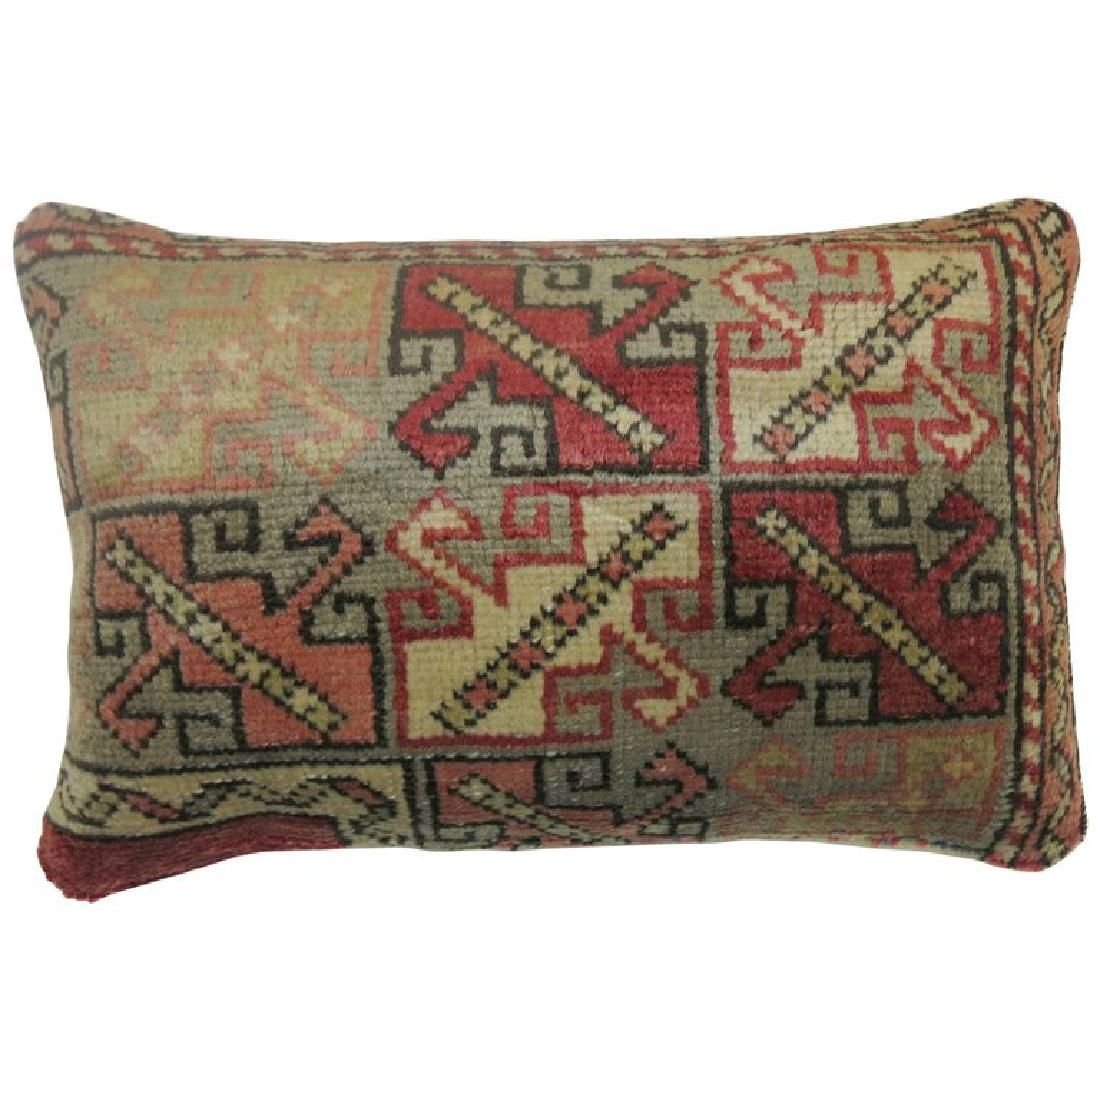 Vintage Turkish Lumbar Rug Pillow